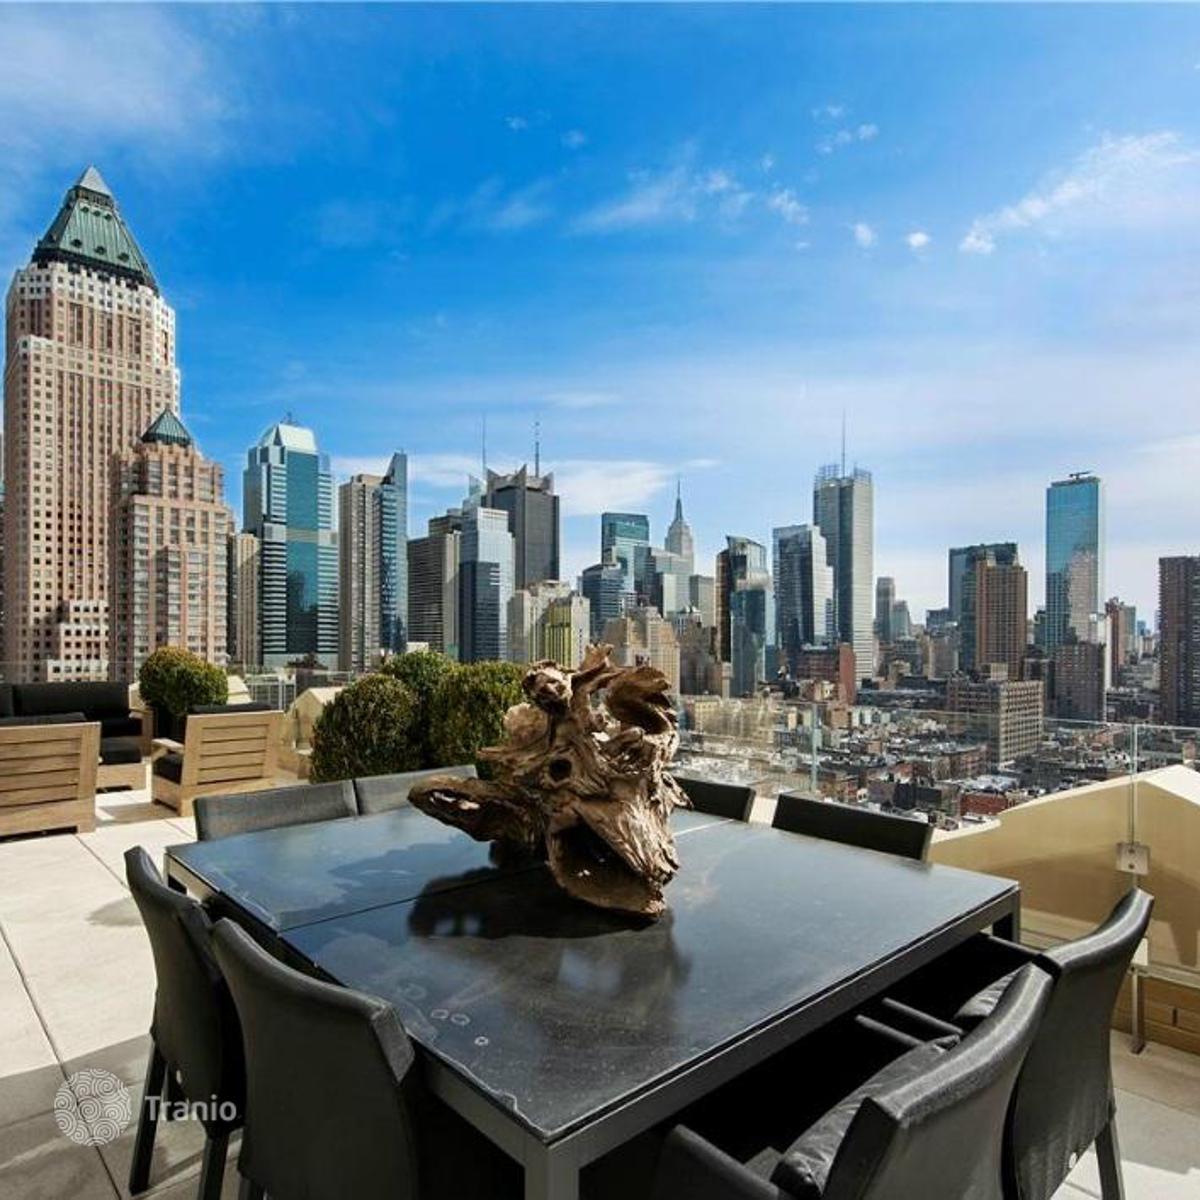 Apartment In New York Manhattan: Listing #1445439 In Midtown Manhattan, Manhattan, New York